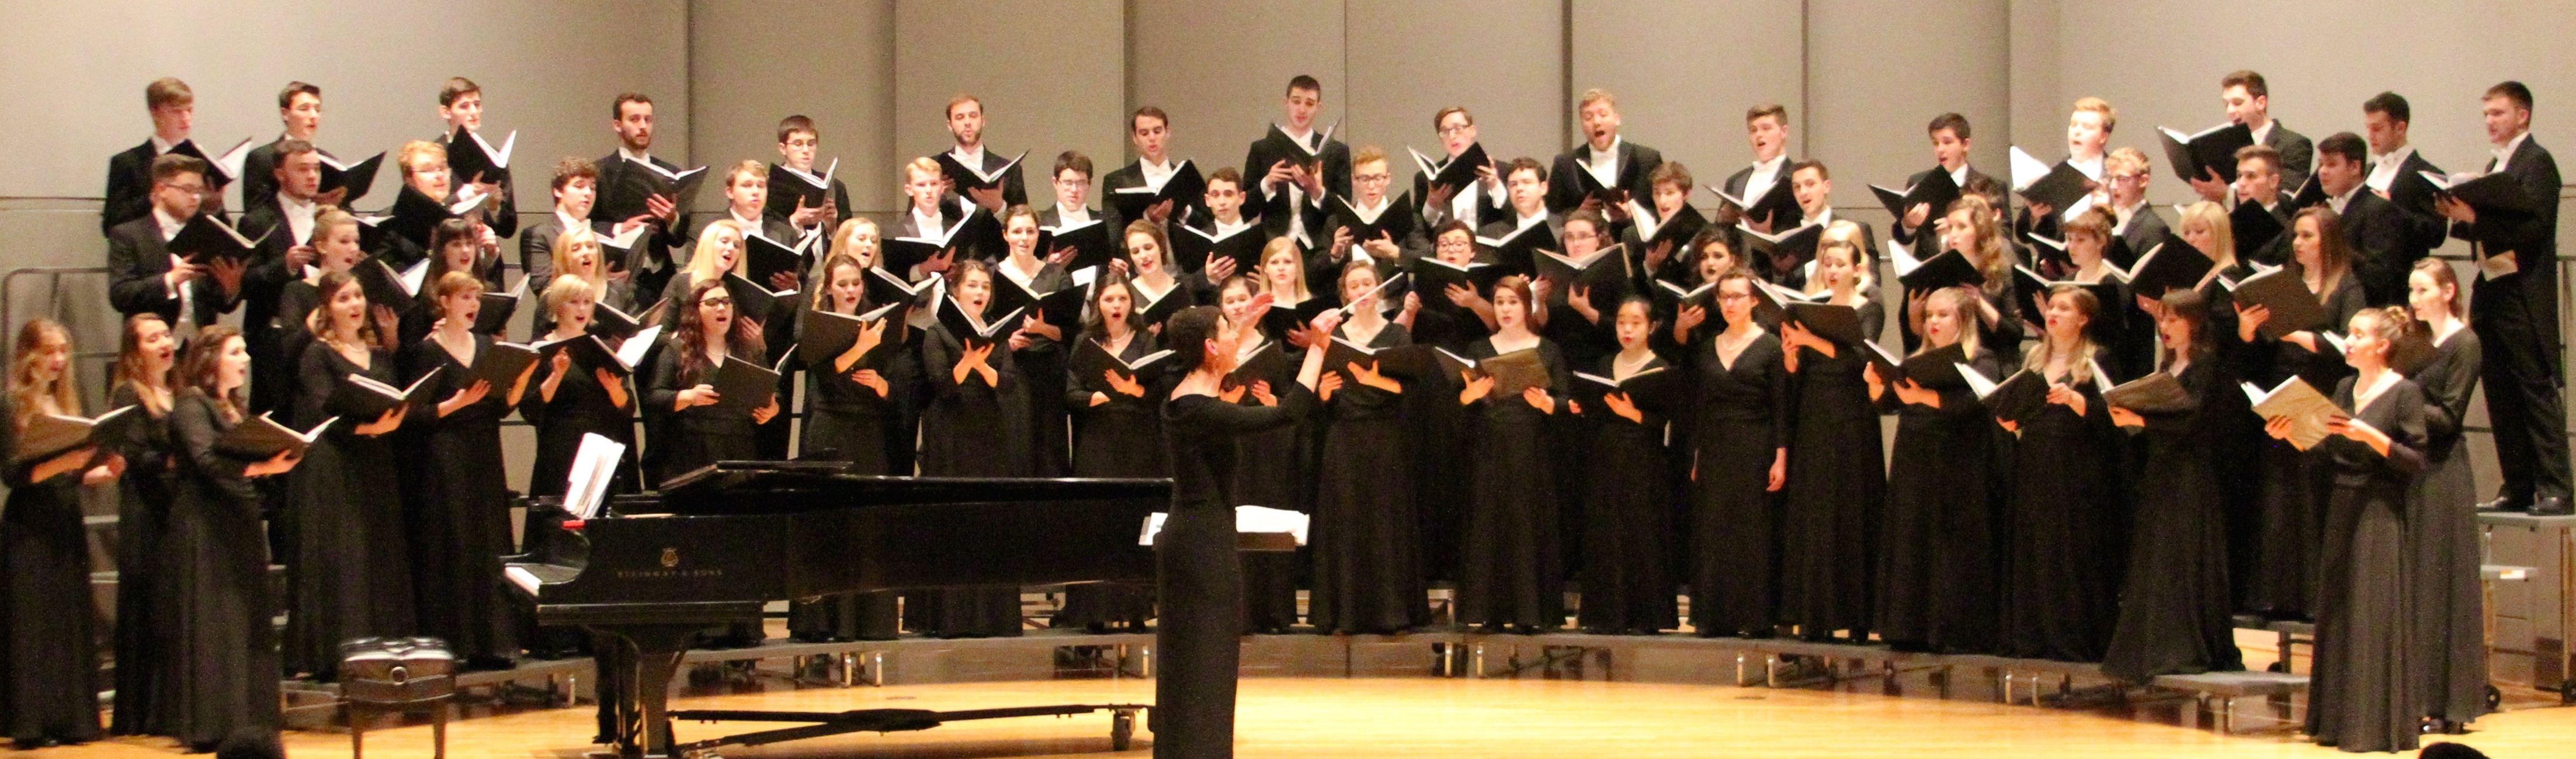 St Martin In The Fields Choir Tour